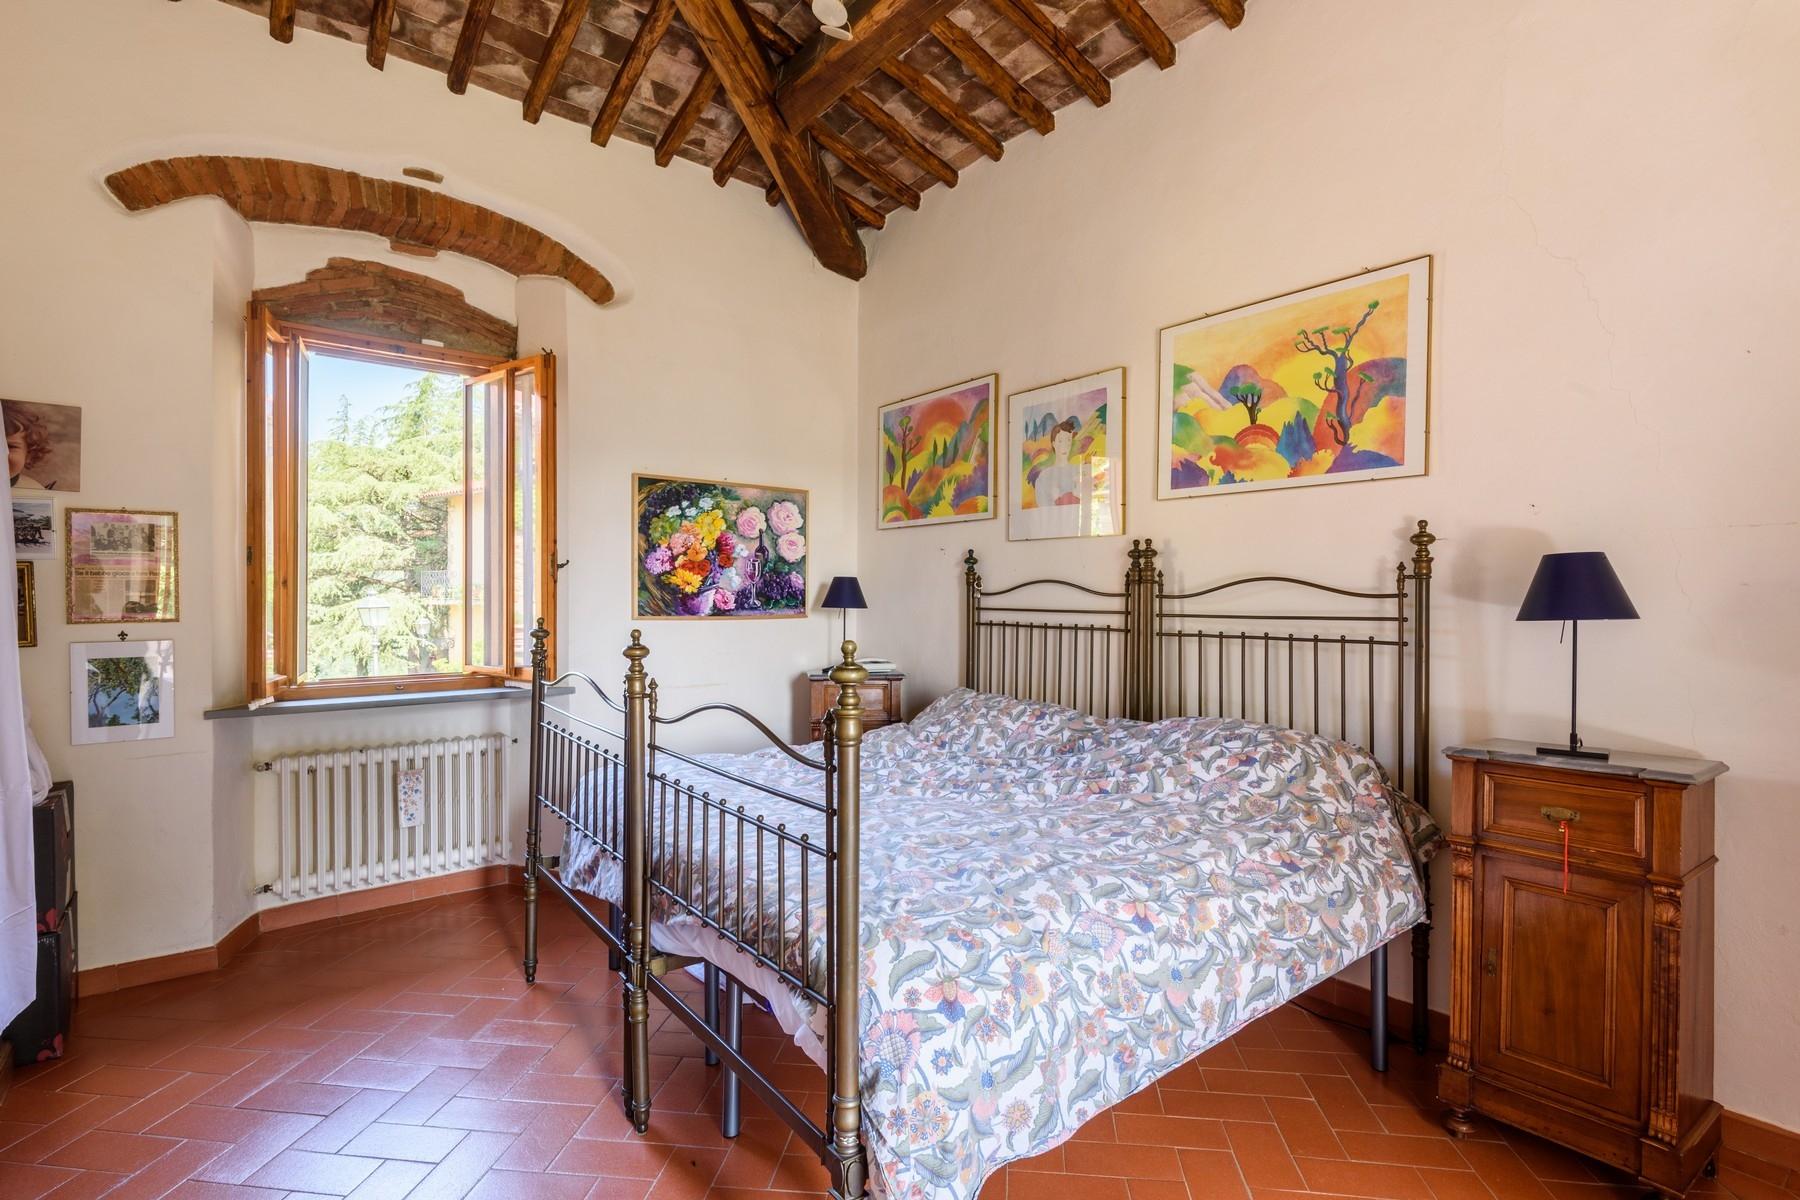 Villa in Vendita a Greve In Chianti: 5 locali, 491 mq - Foto 17